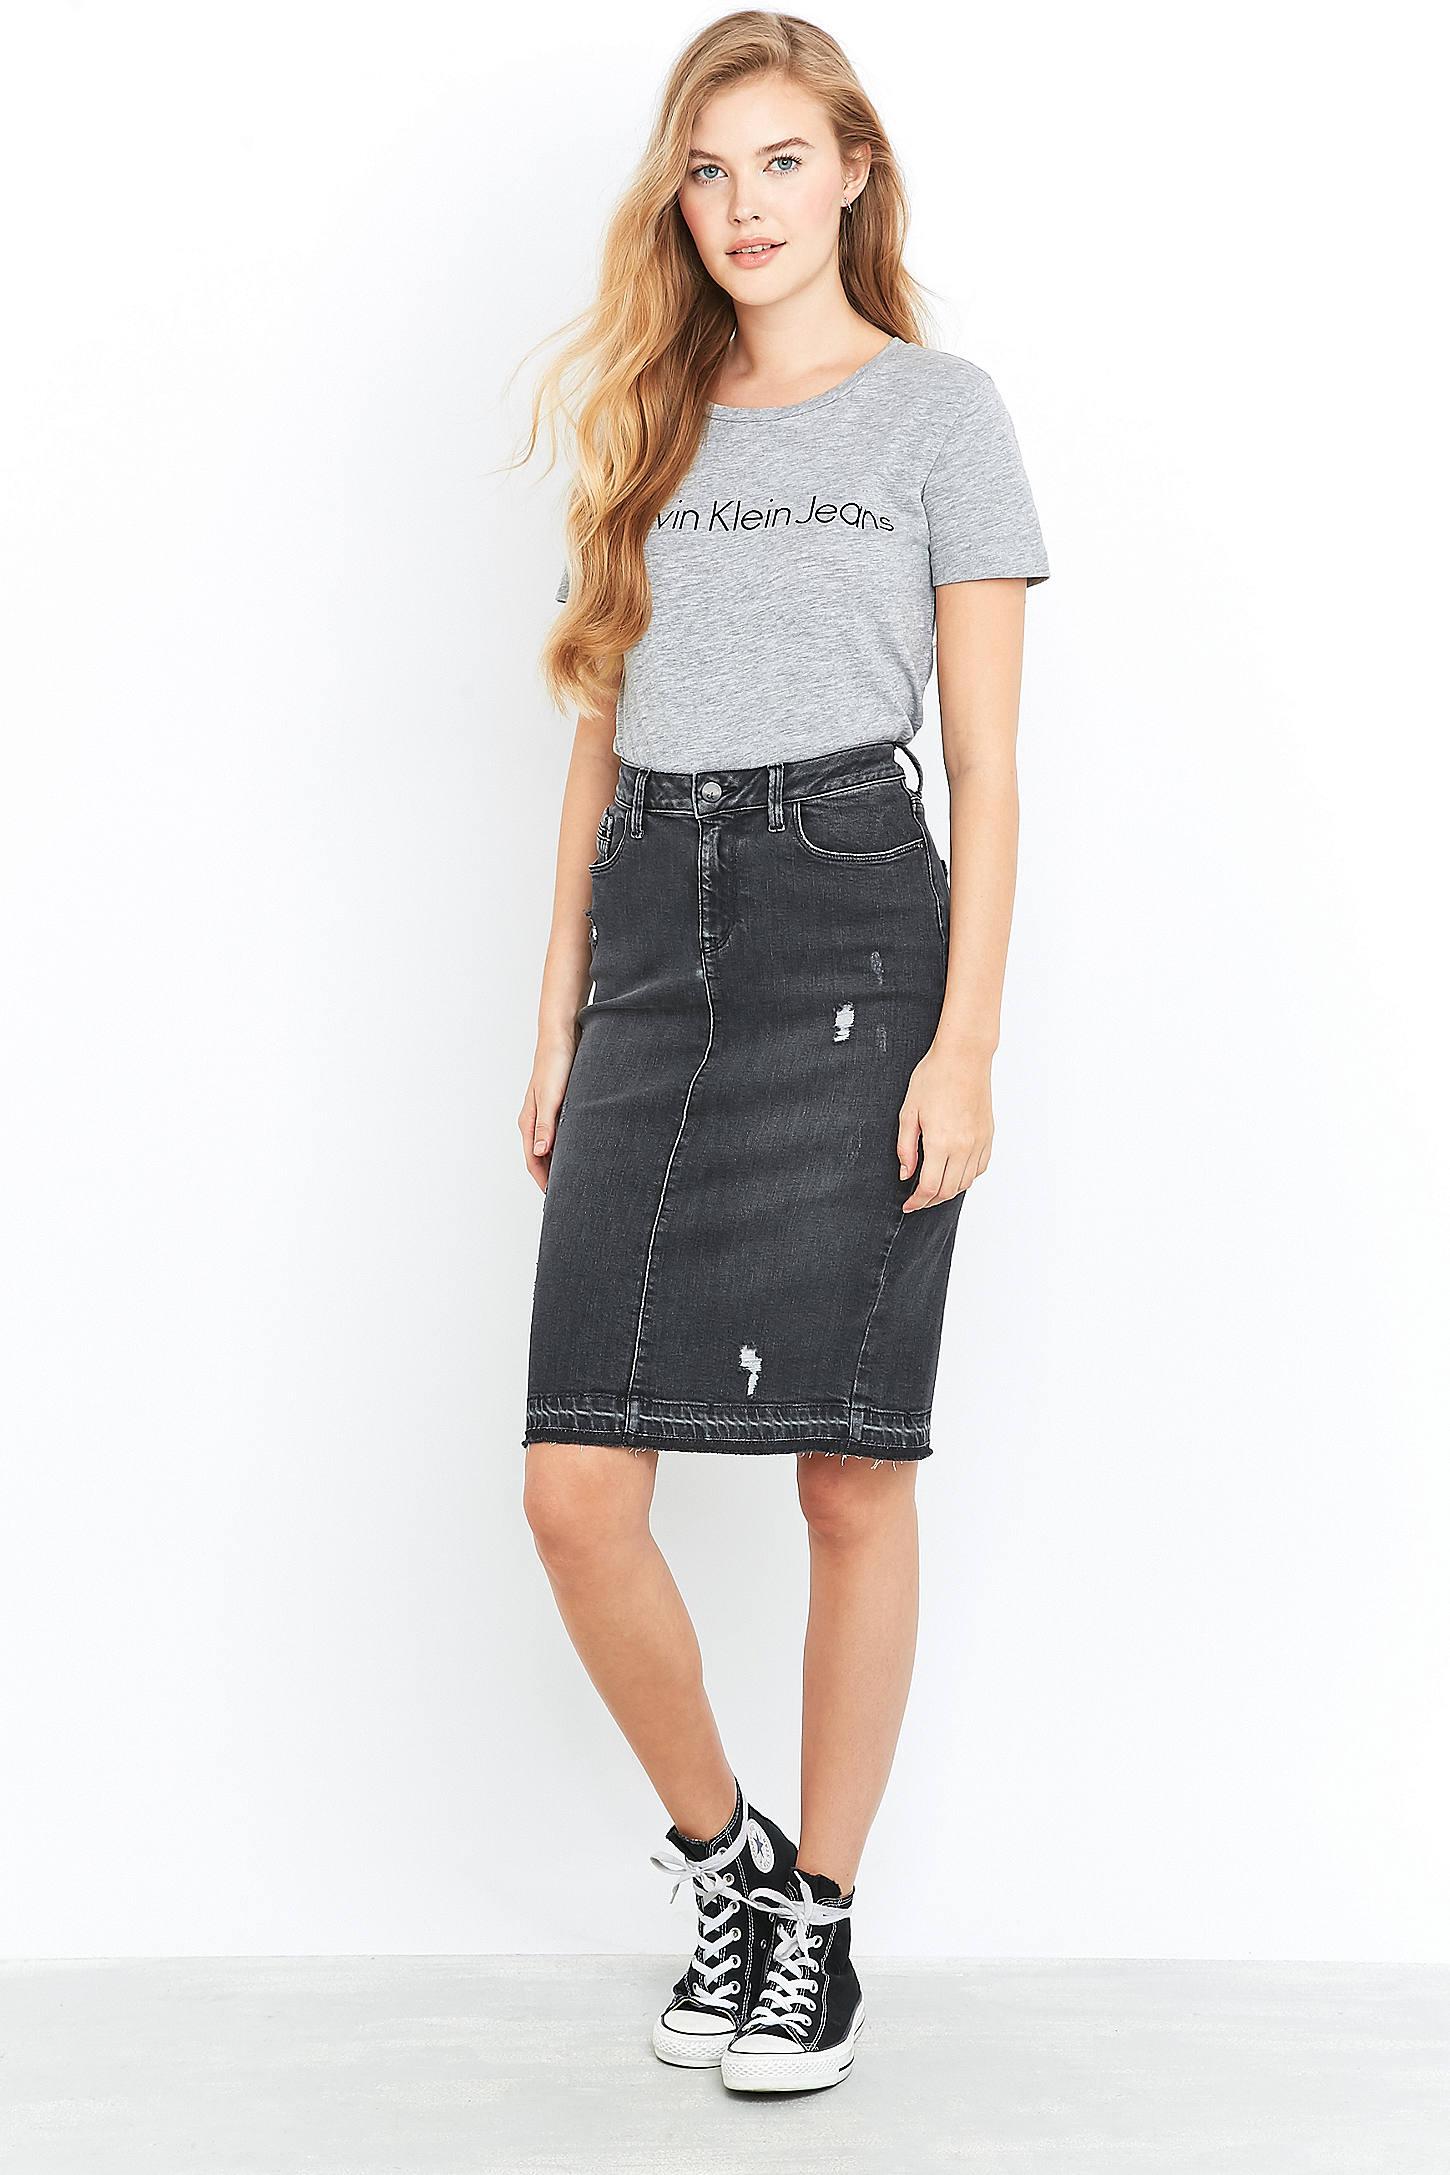 Black Denim Pencil Skirt - Dress Ala